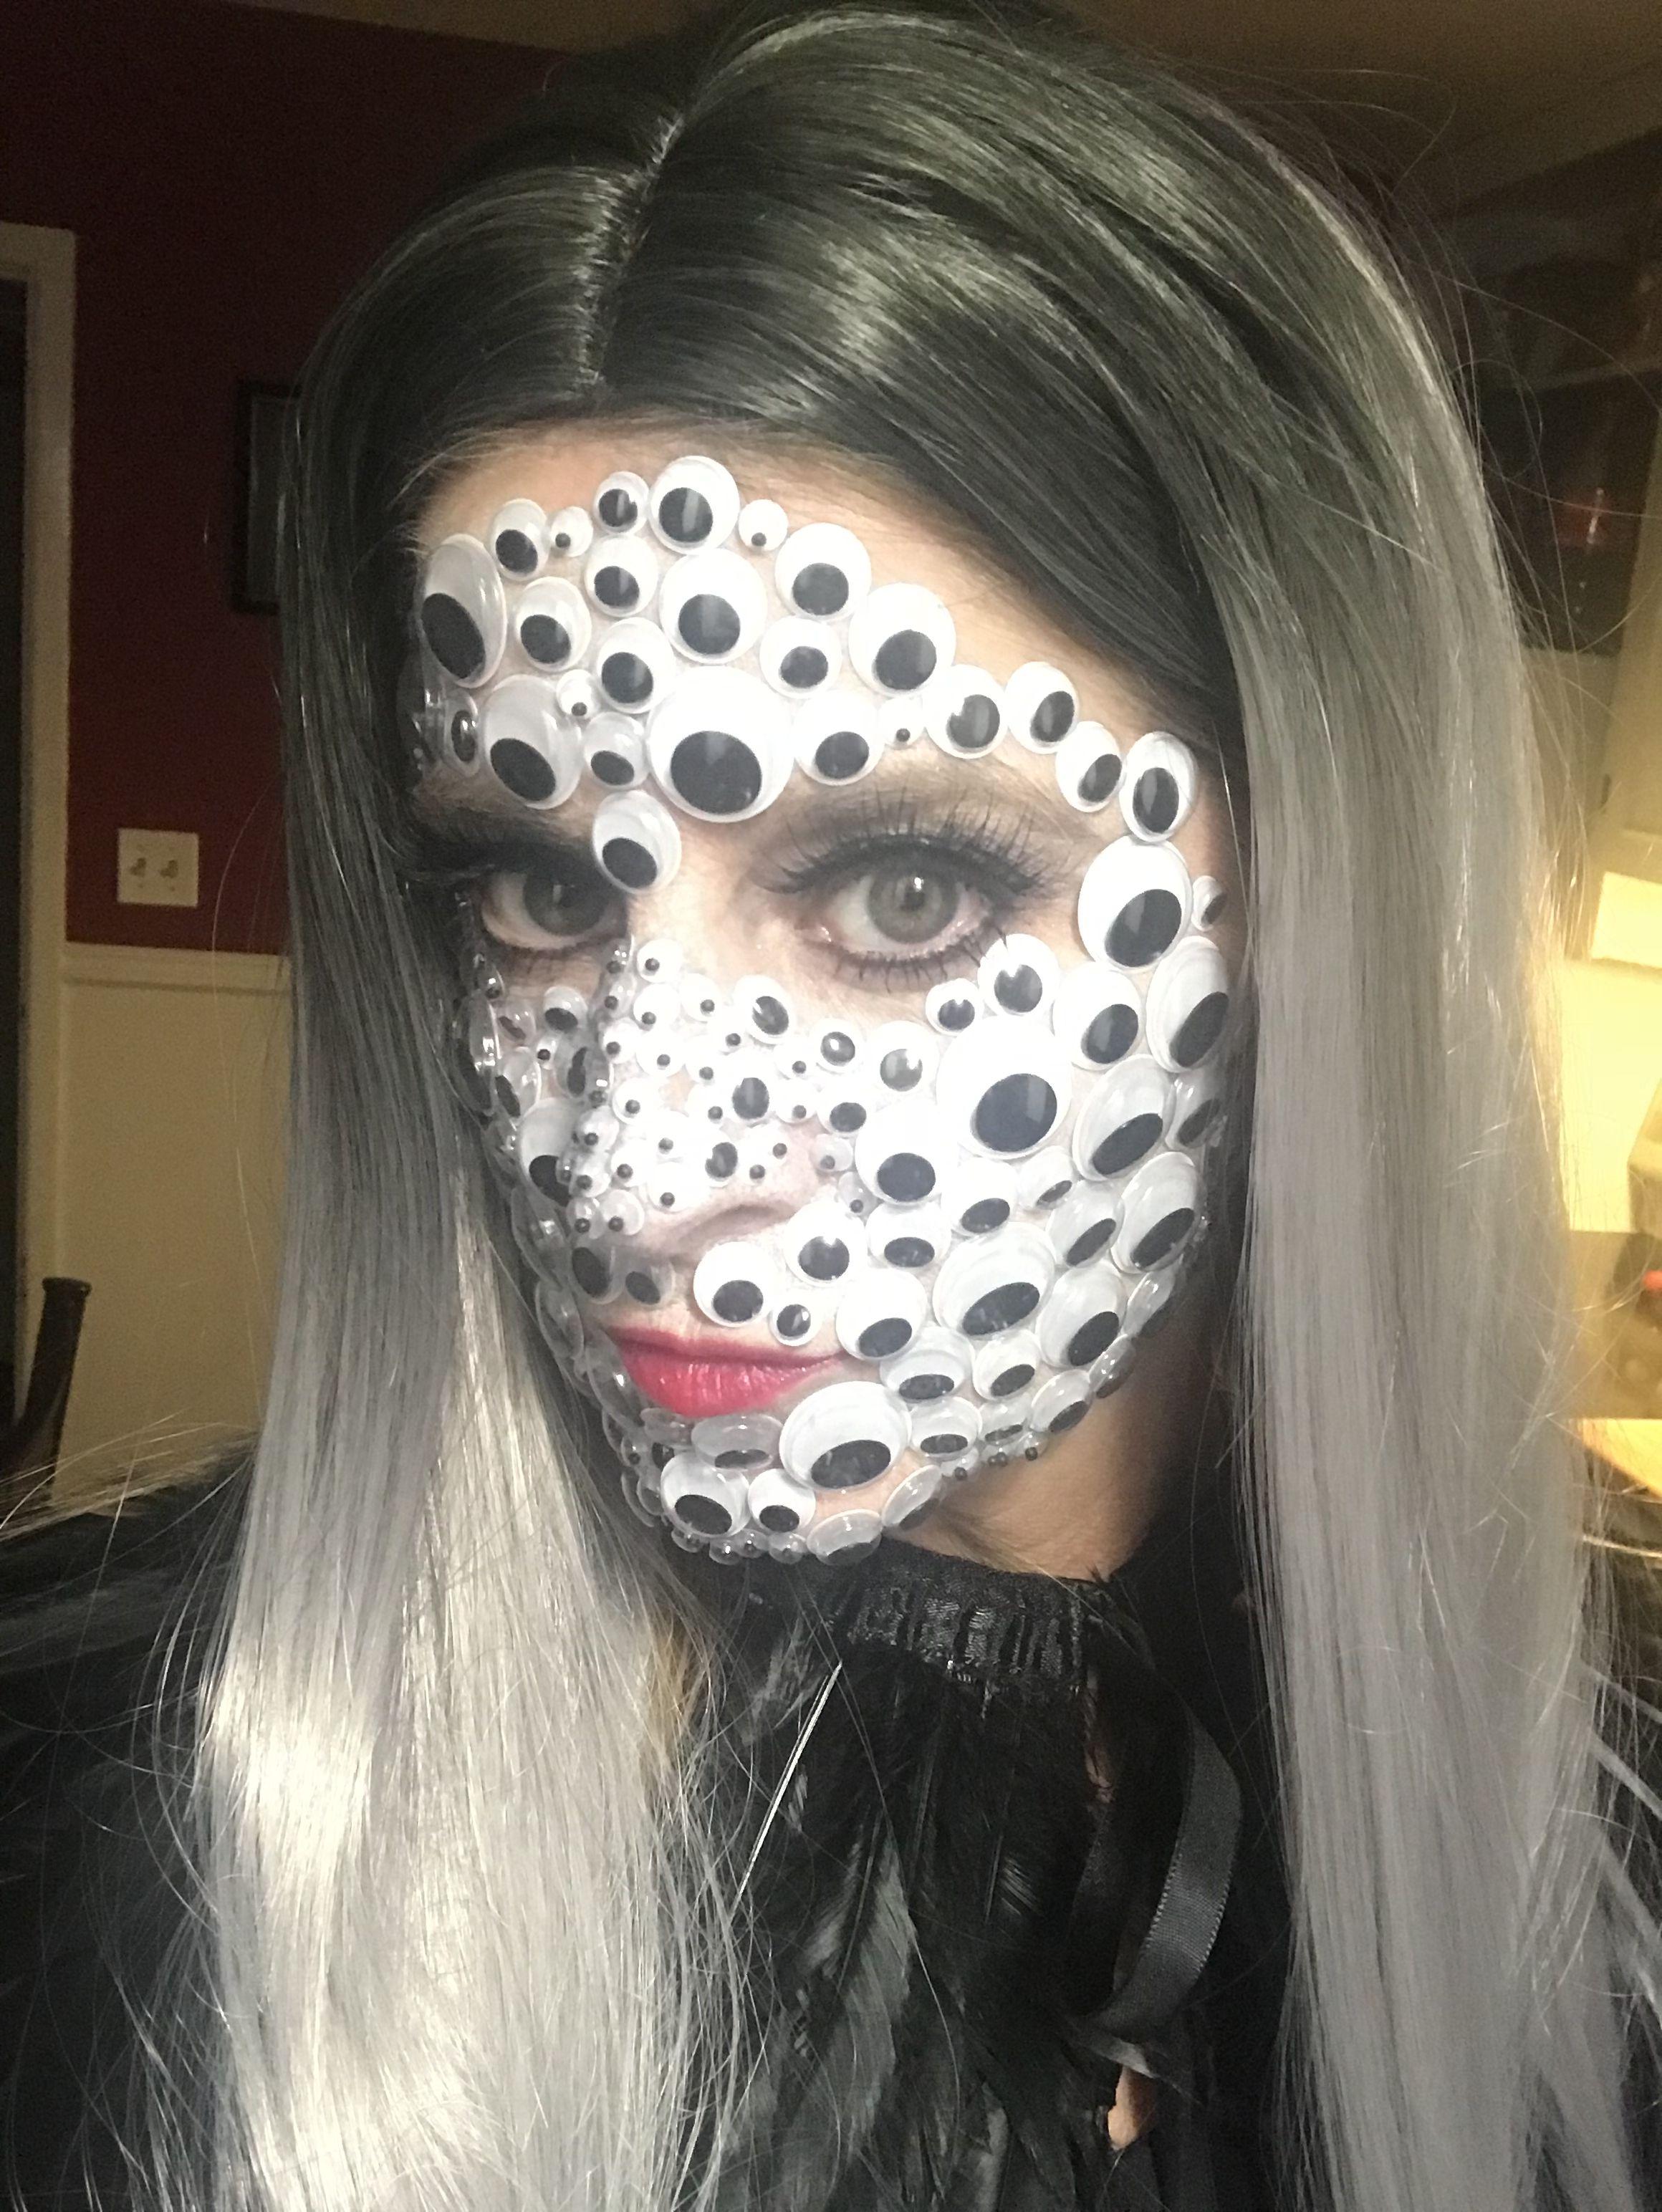 Googly Eyes Halloween Halloween Face Makeup Face Makeup Halloween Face